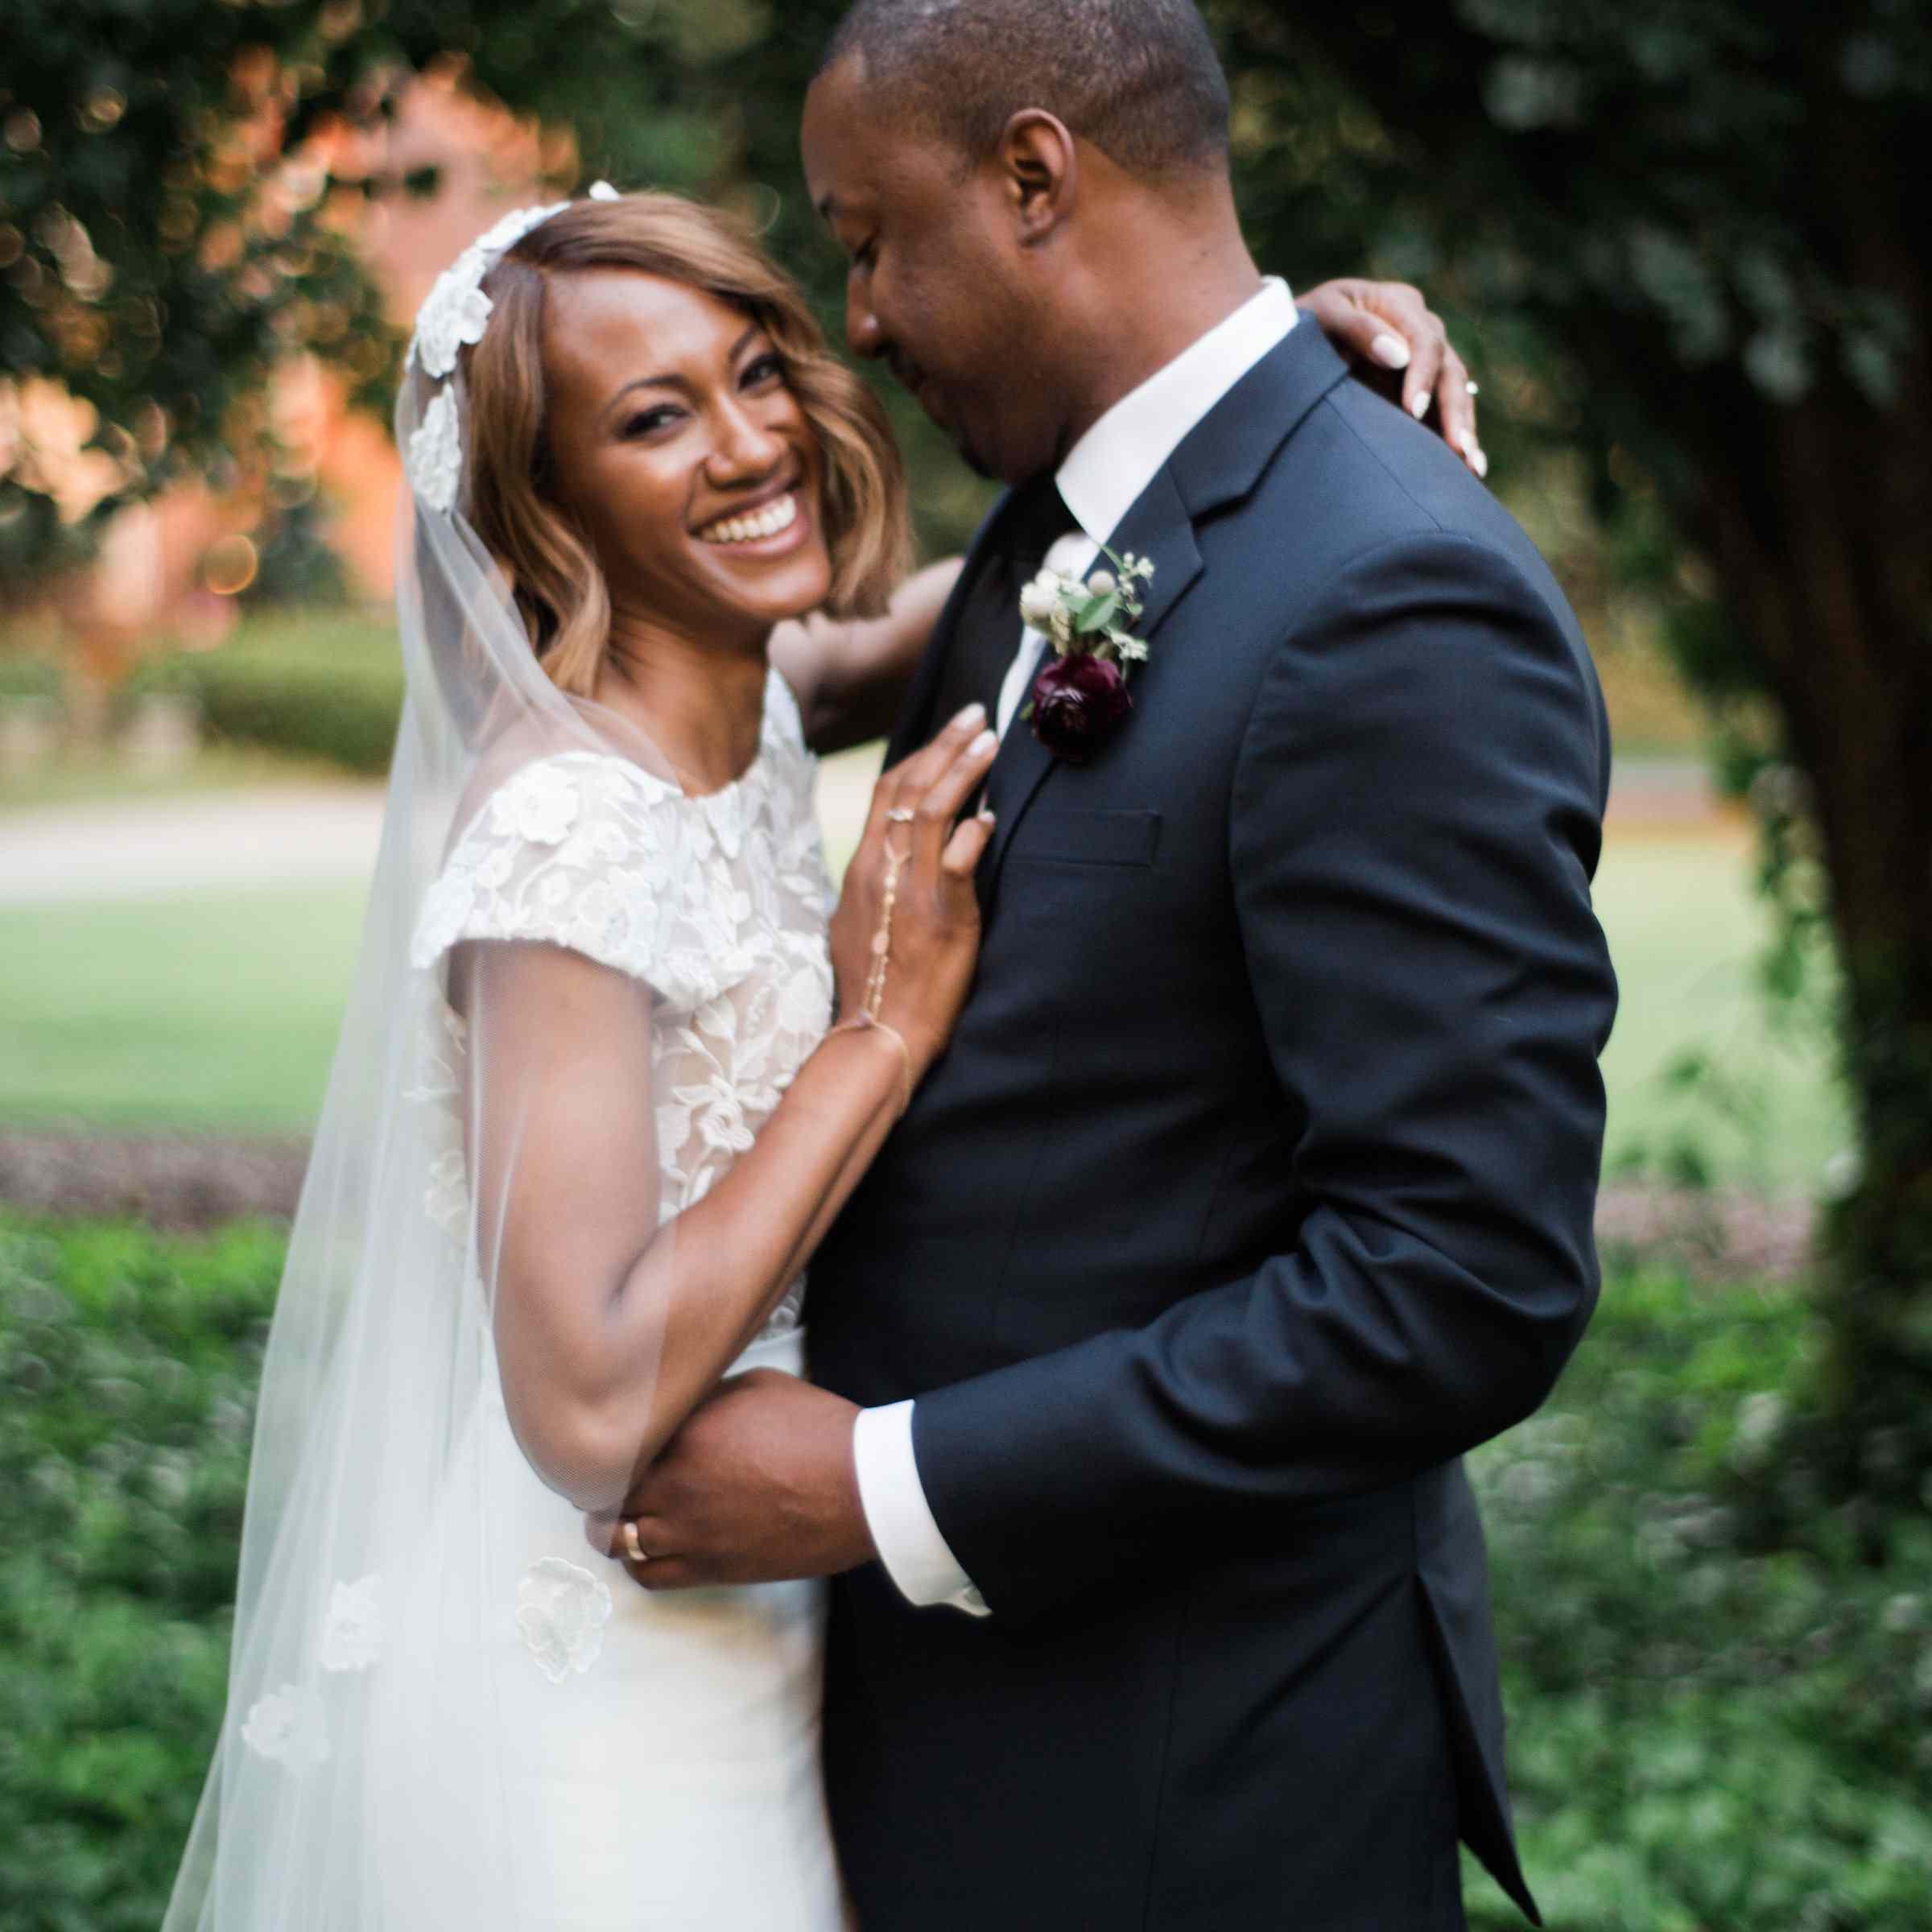 couple embracing eachother